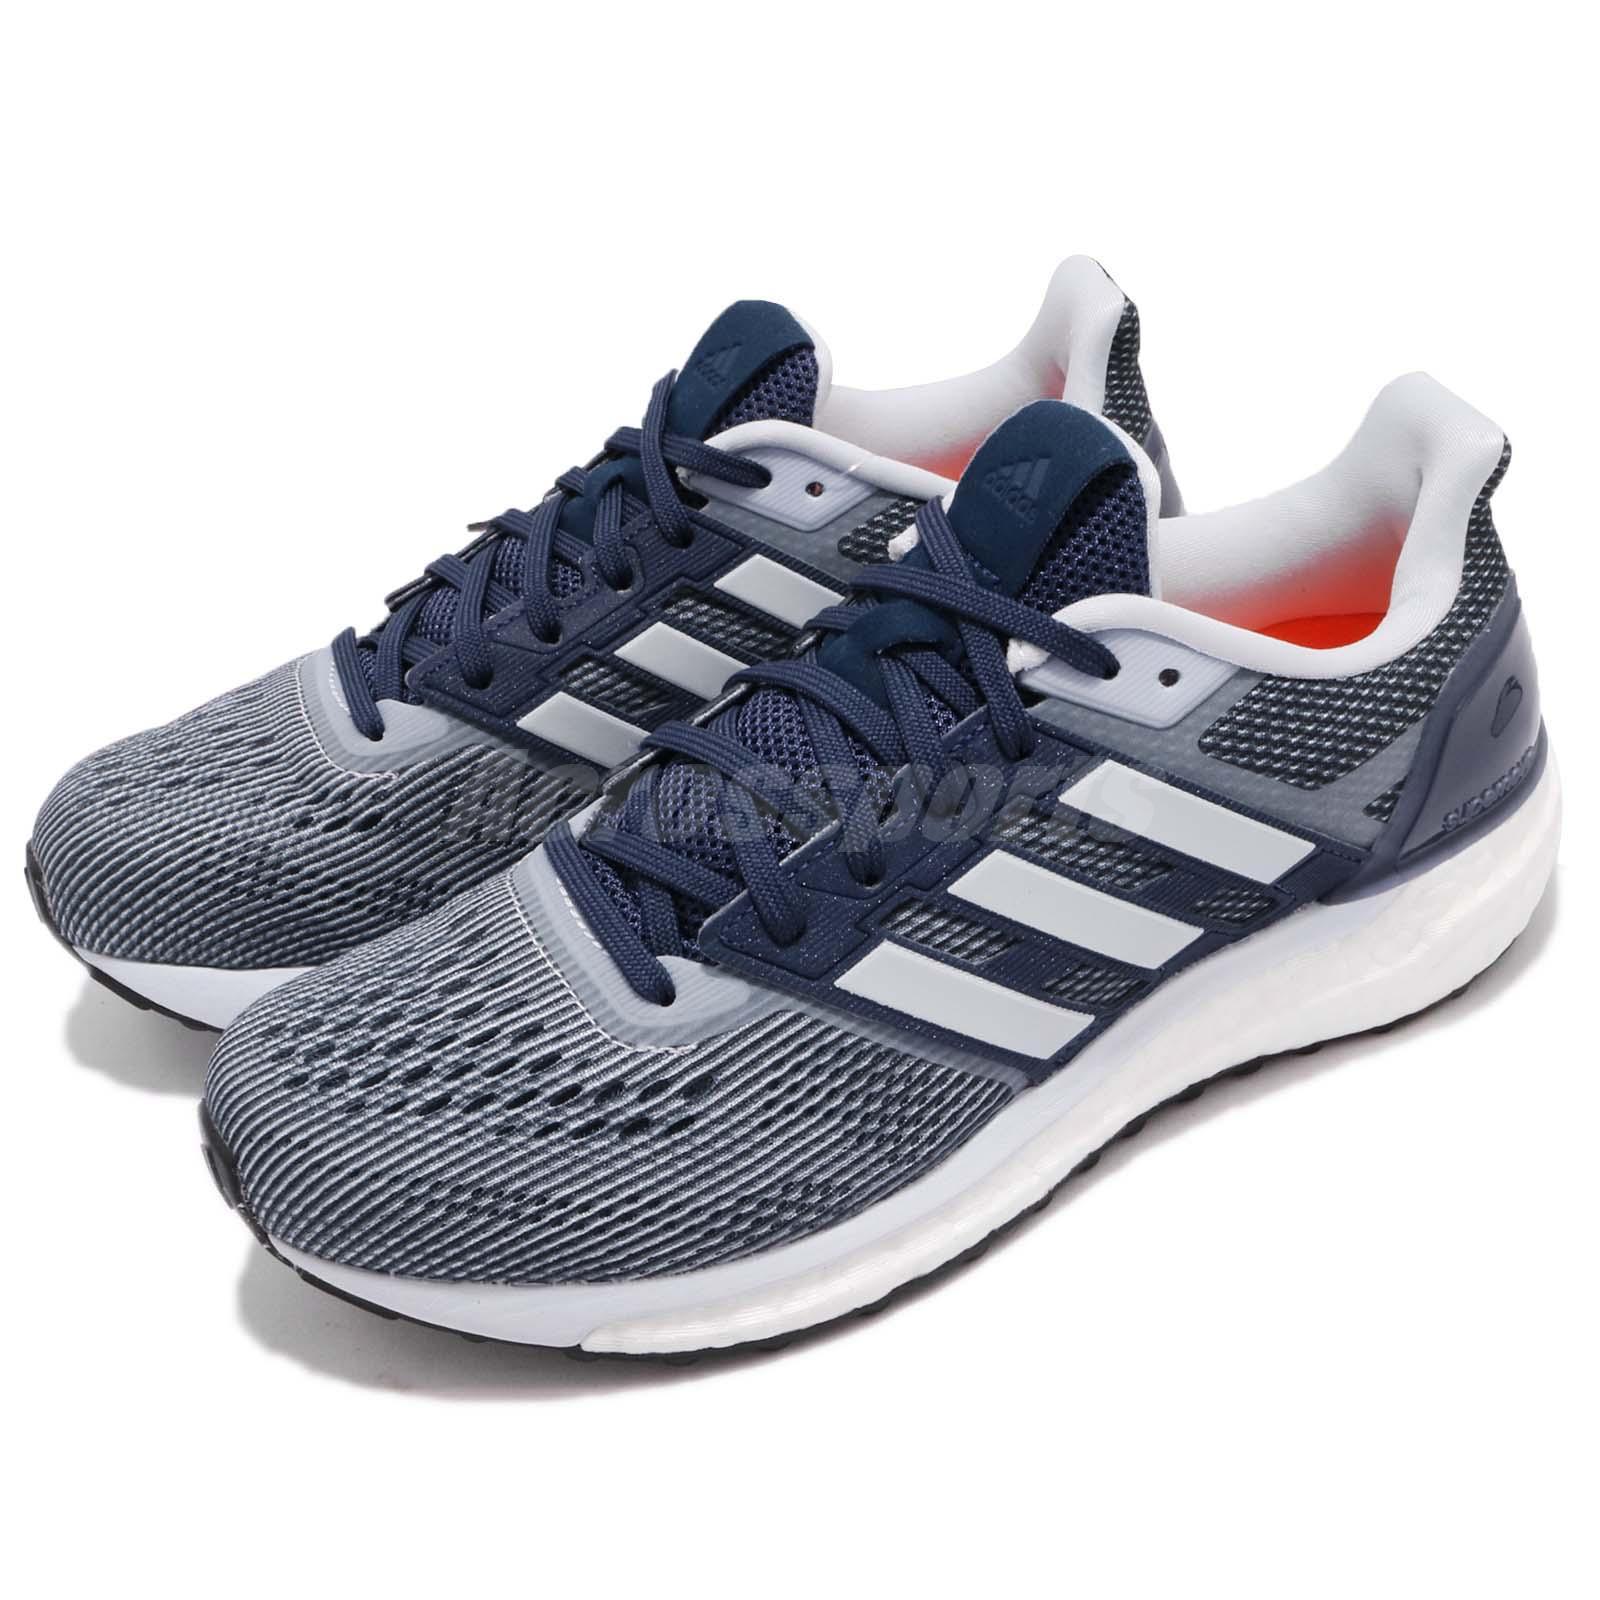 52b92abaa880f Details about adidas Supernova W Noble Indigo Aero Blue Women Running Shoe  Sneakers CG4039